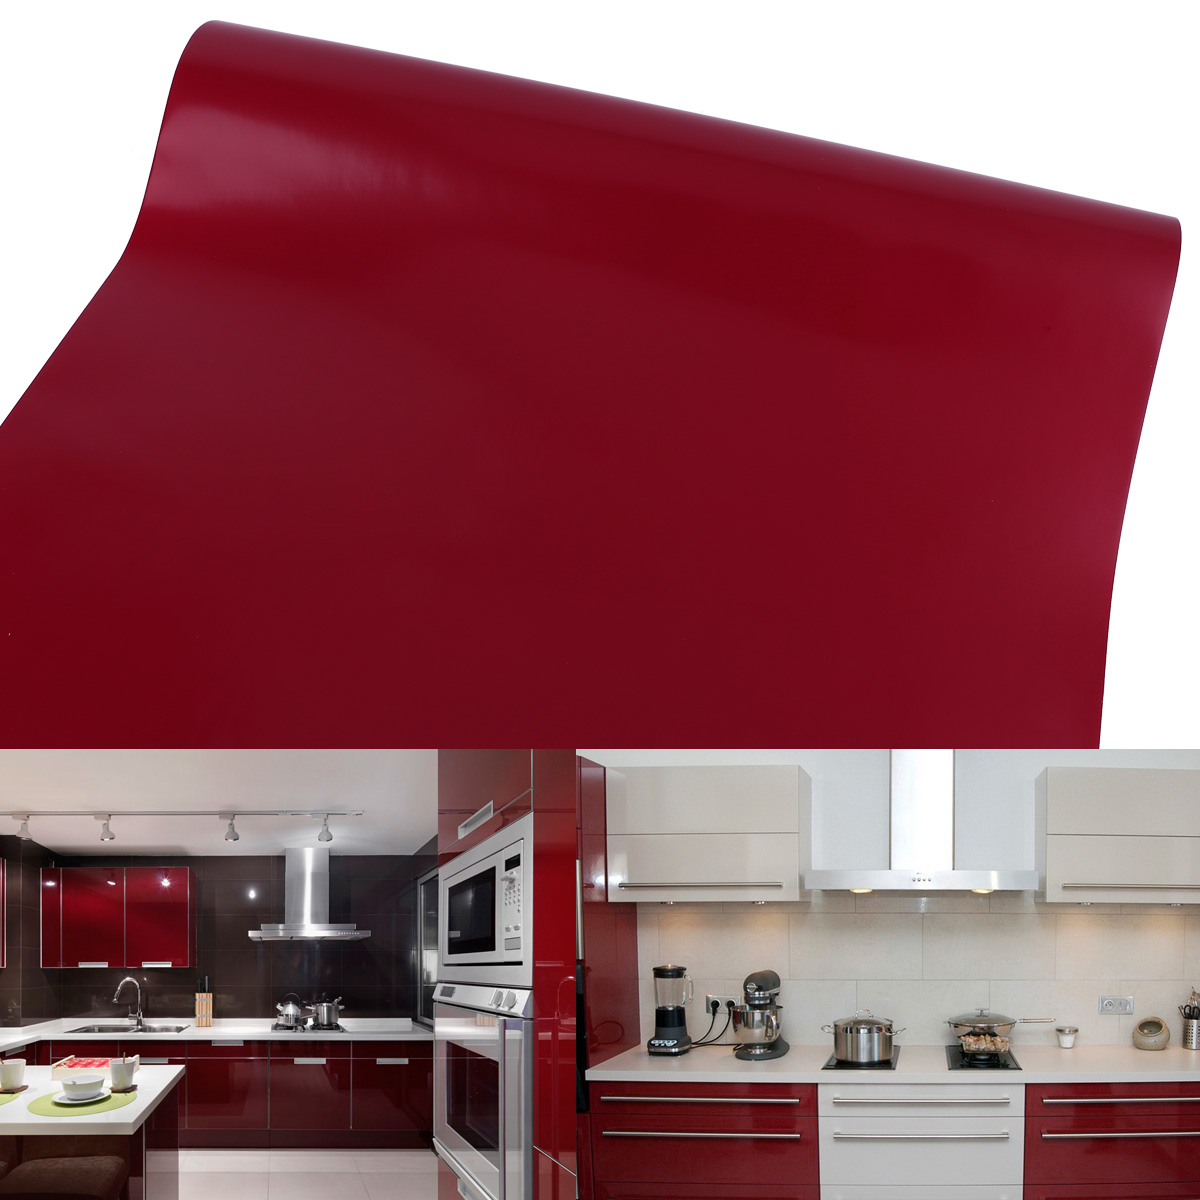 Kitchen Wallpaper Ebay Uk: Vinyl Kitchen Water Oil Protect Self Adhesive Contact